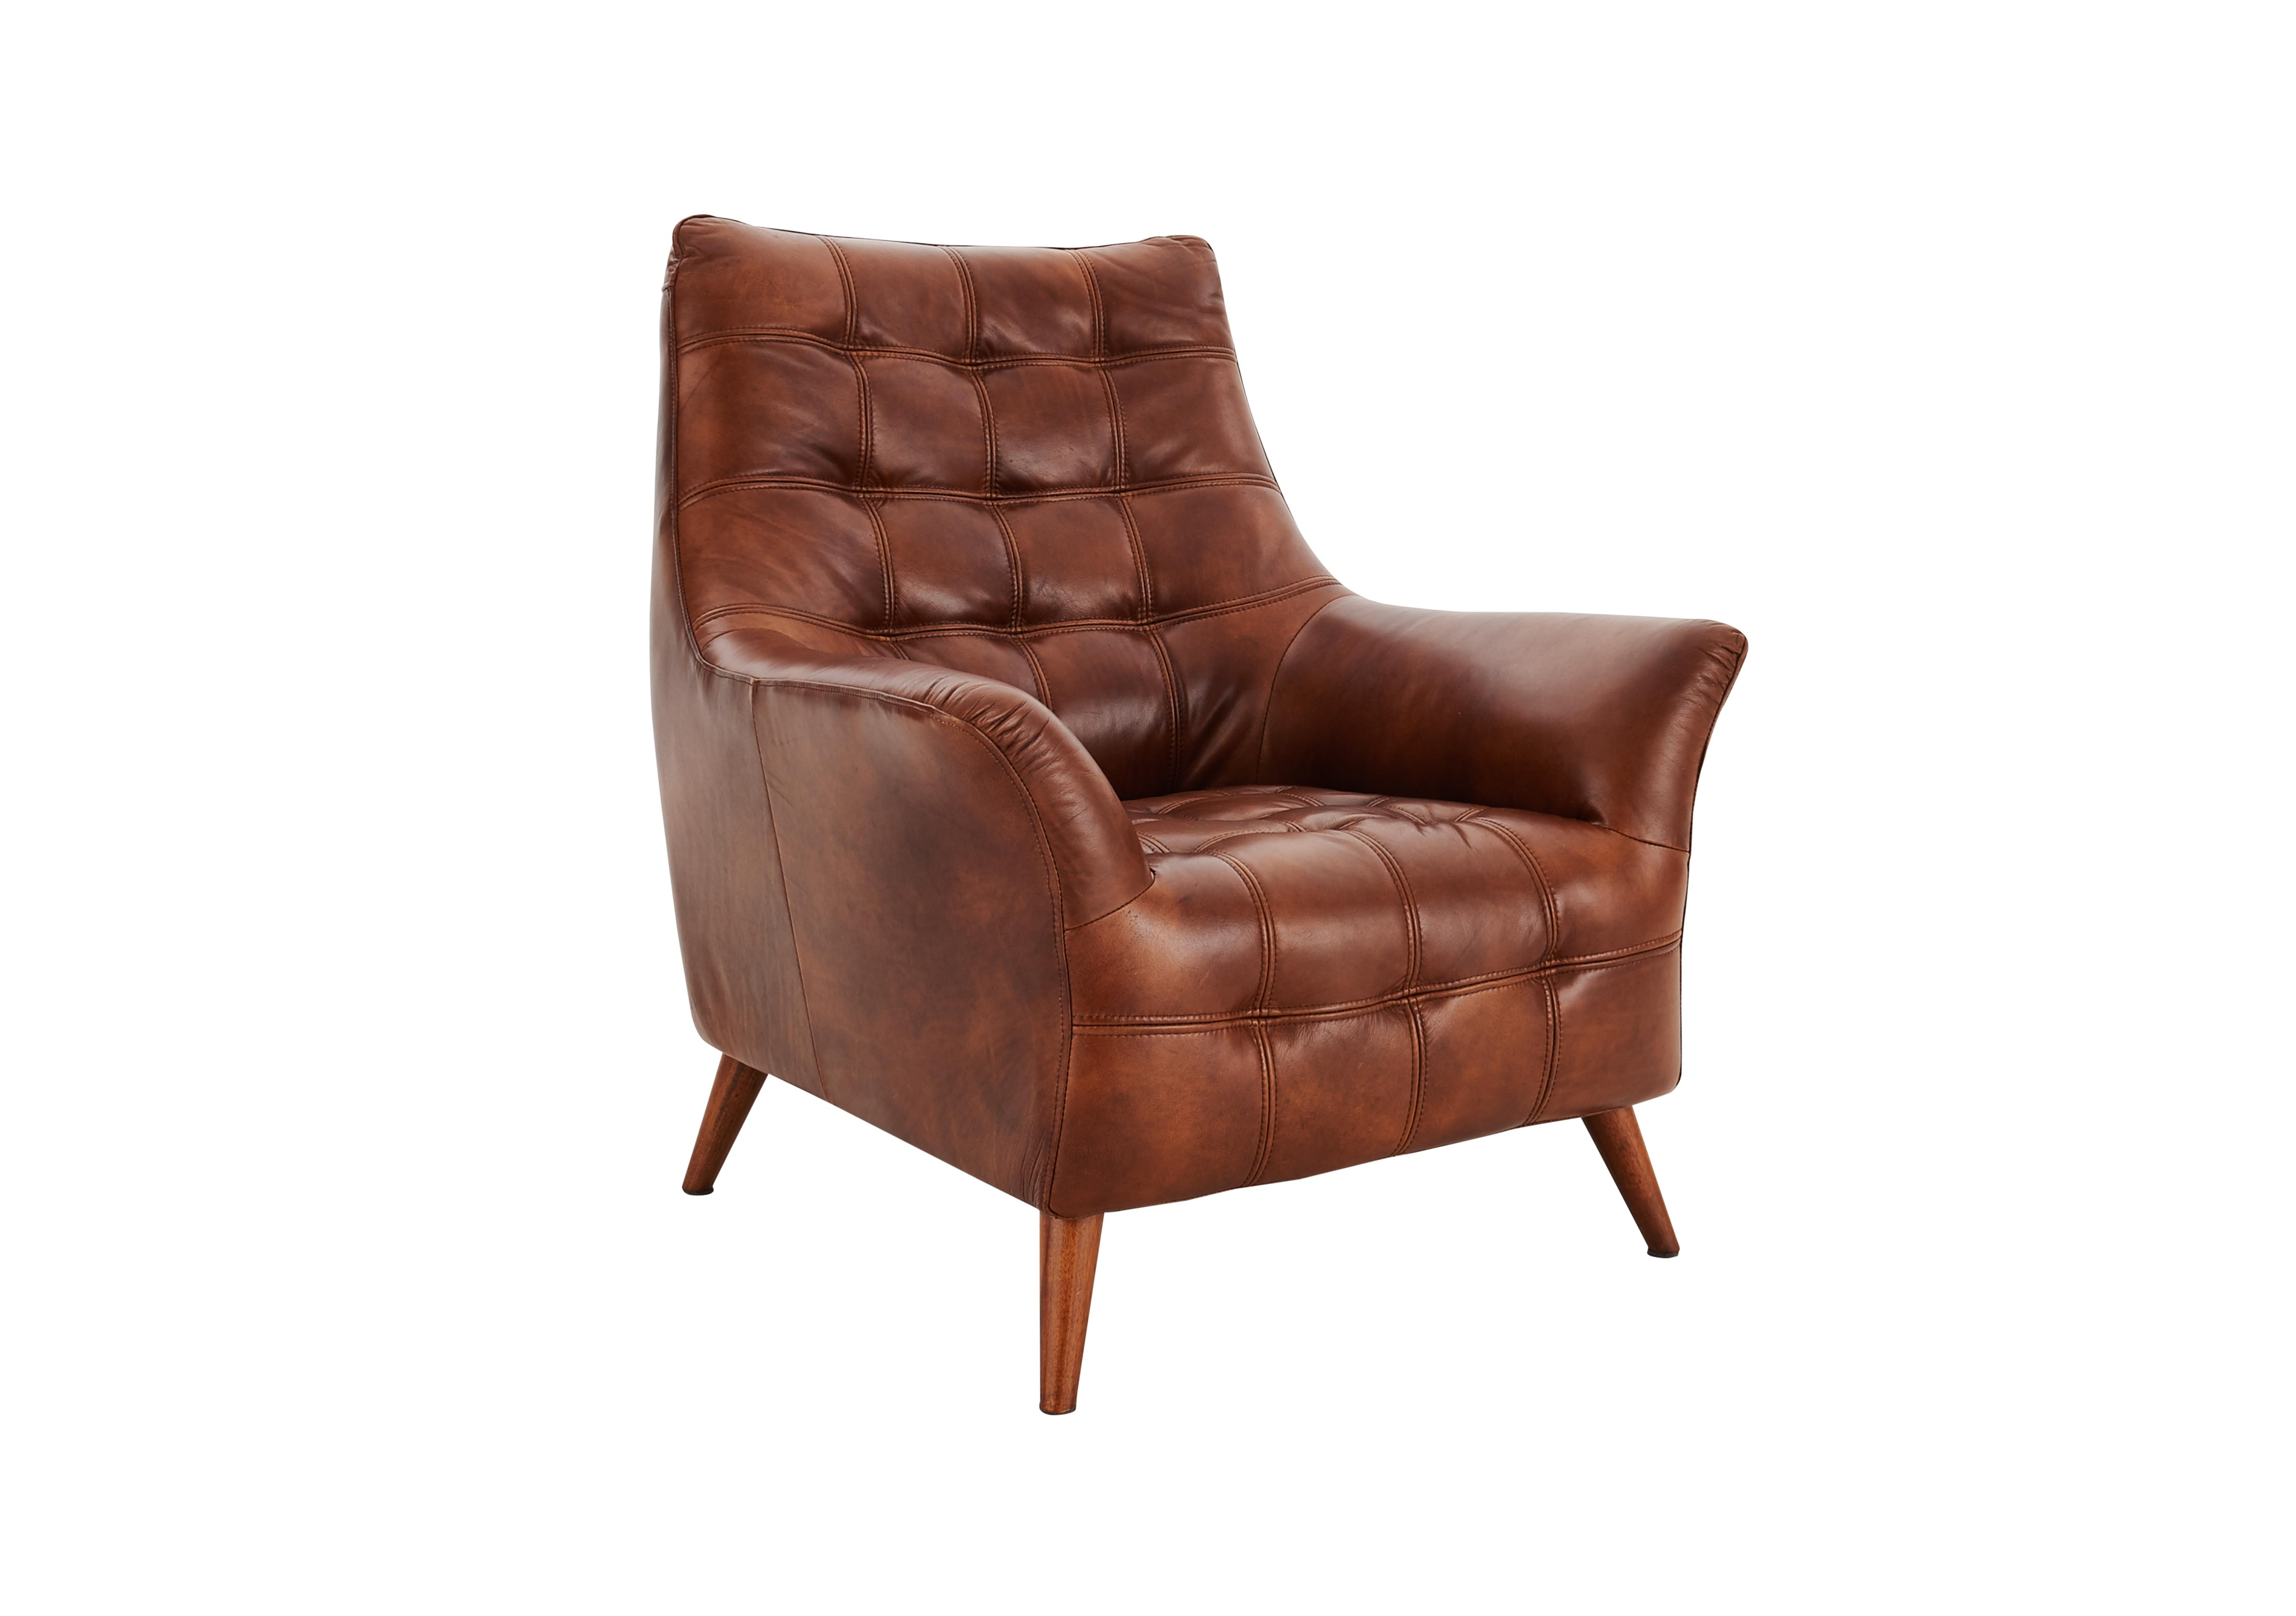 Furniture Village Ipswich delighful furniture village ipswich is rebranding to attract a